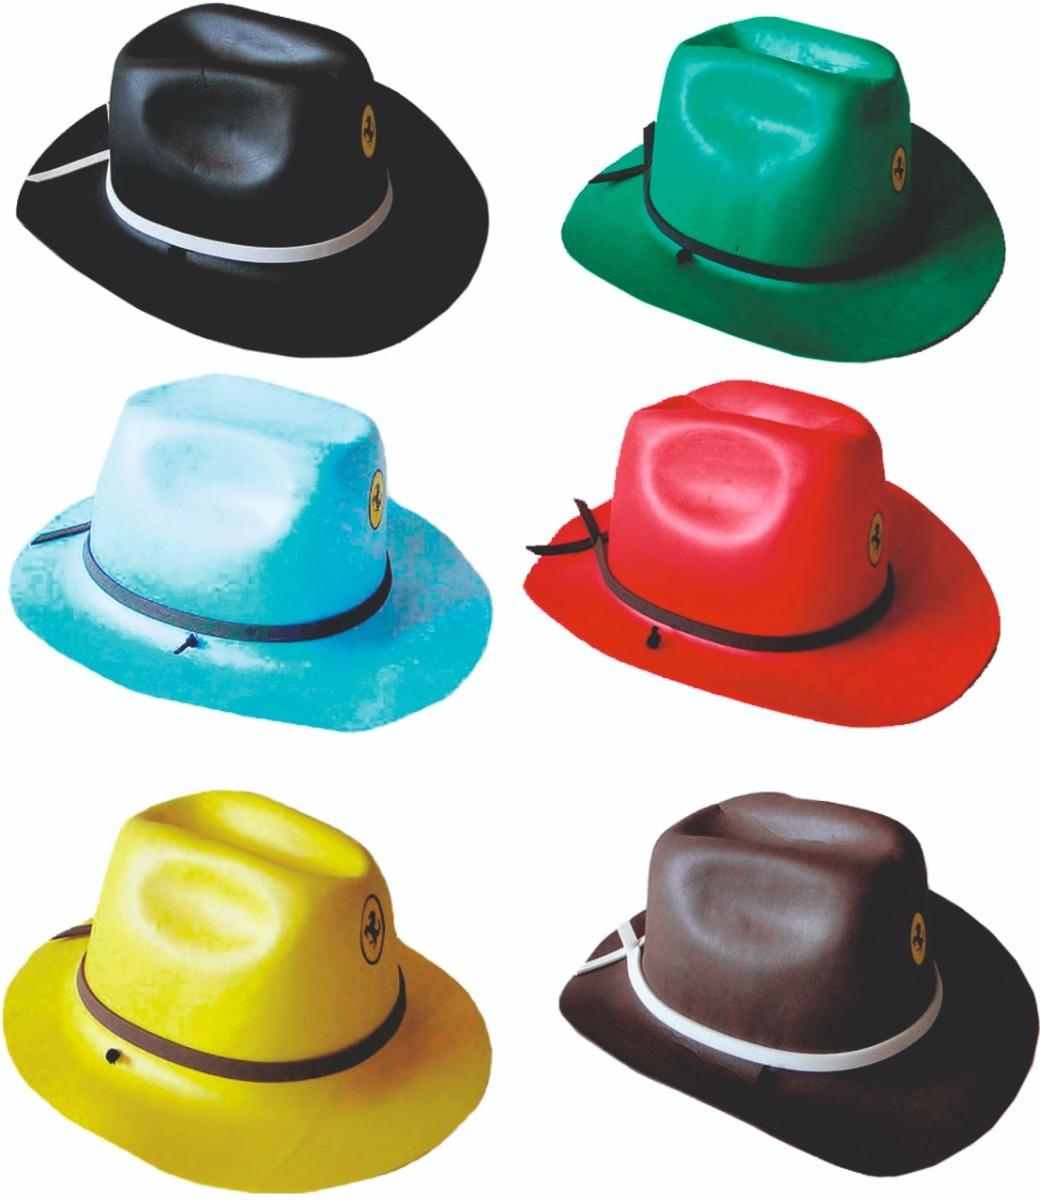 Chapéu Cowboy Eva Infantil Cores Sortidas 20 Unidades - R  99,00 em ... 3eb49446d2